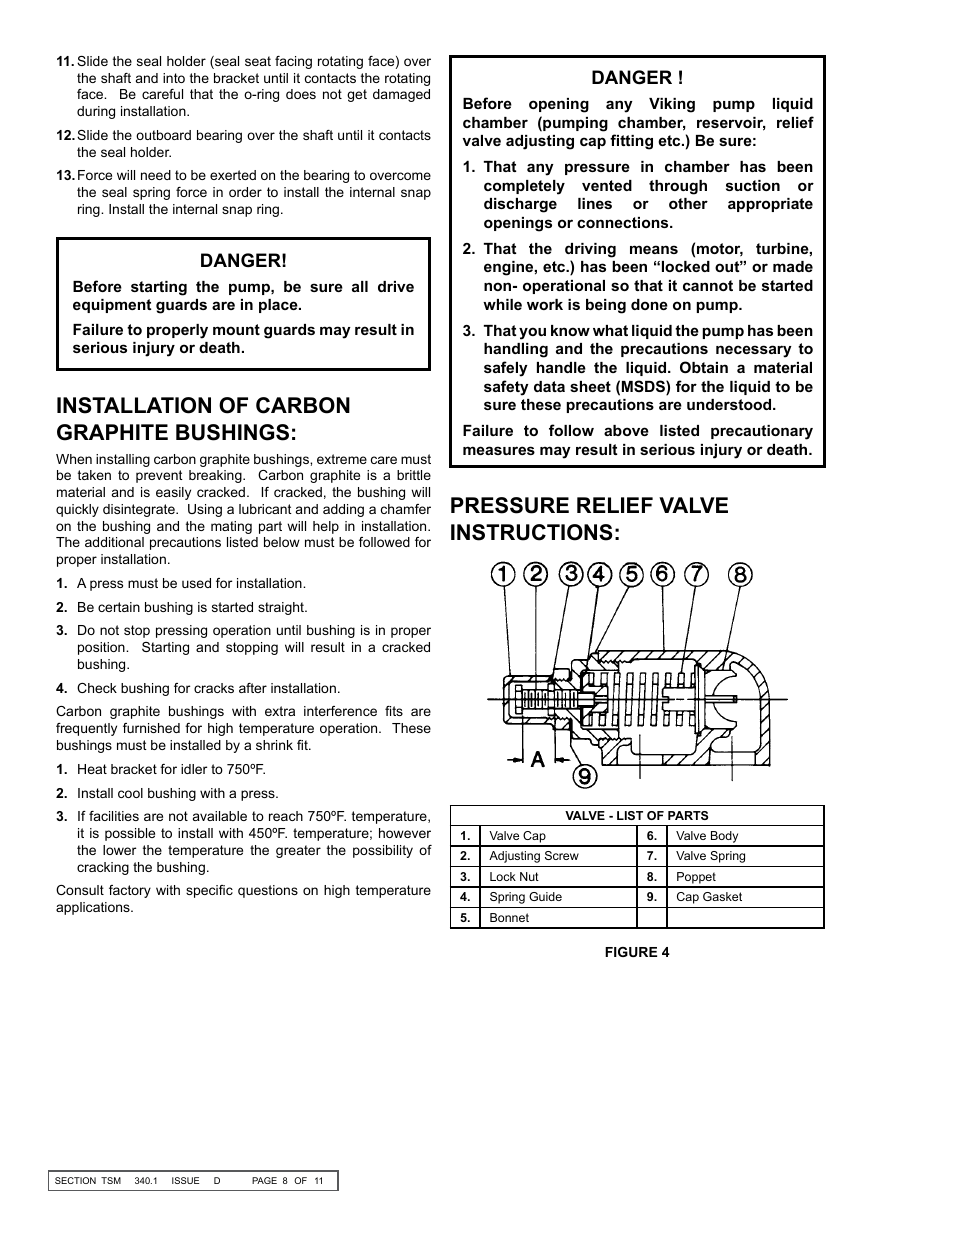 Installation of carbon graphite bushings pressure relief valve installation of carbon graphite bushings pressure relief valve instructions danger viking pump tsm340 publicscrutiny Image collections